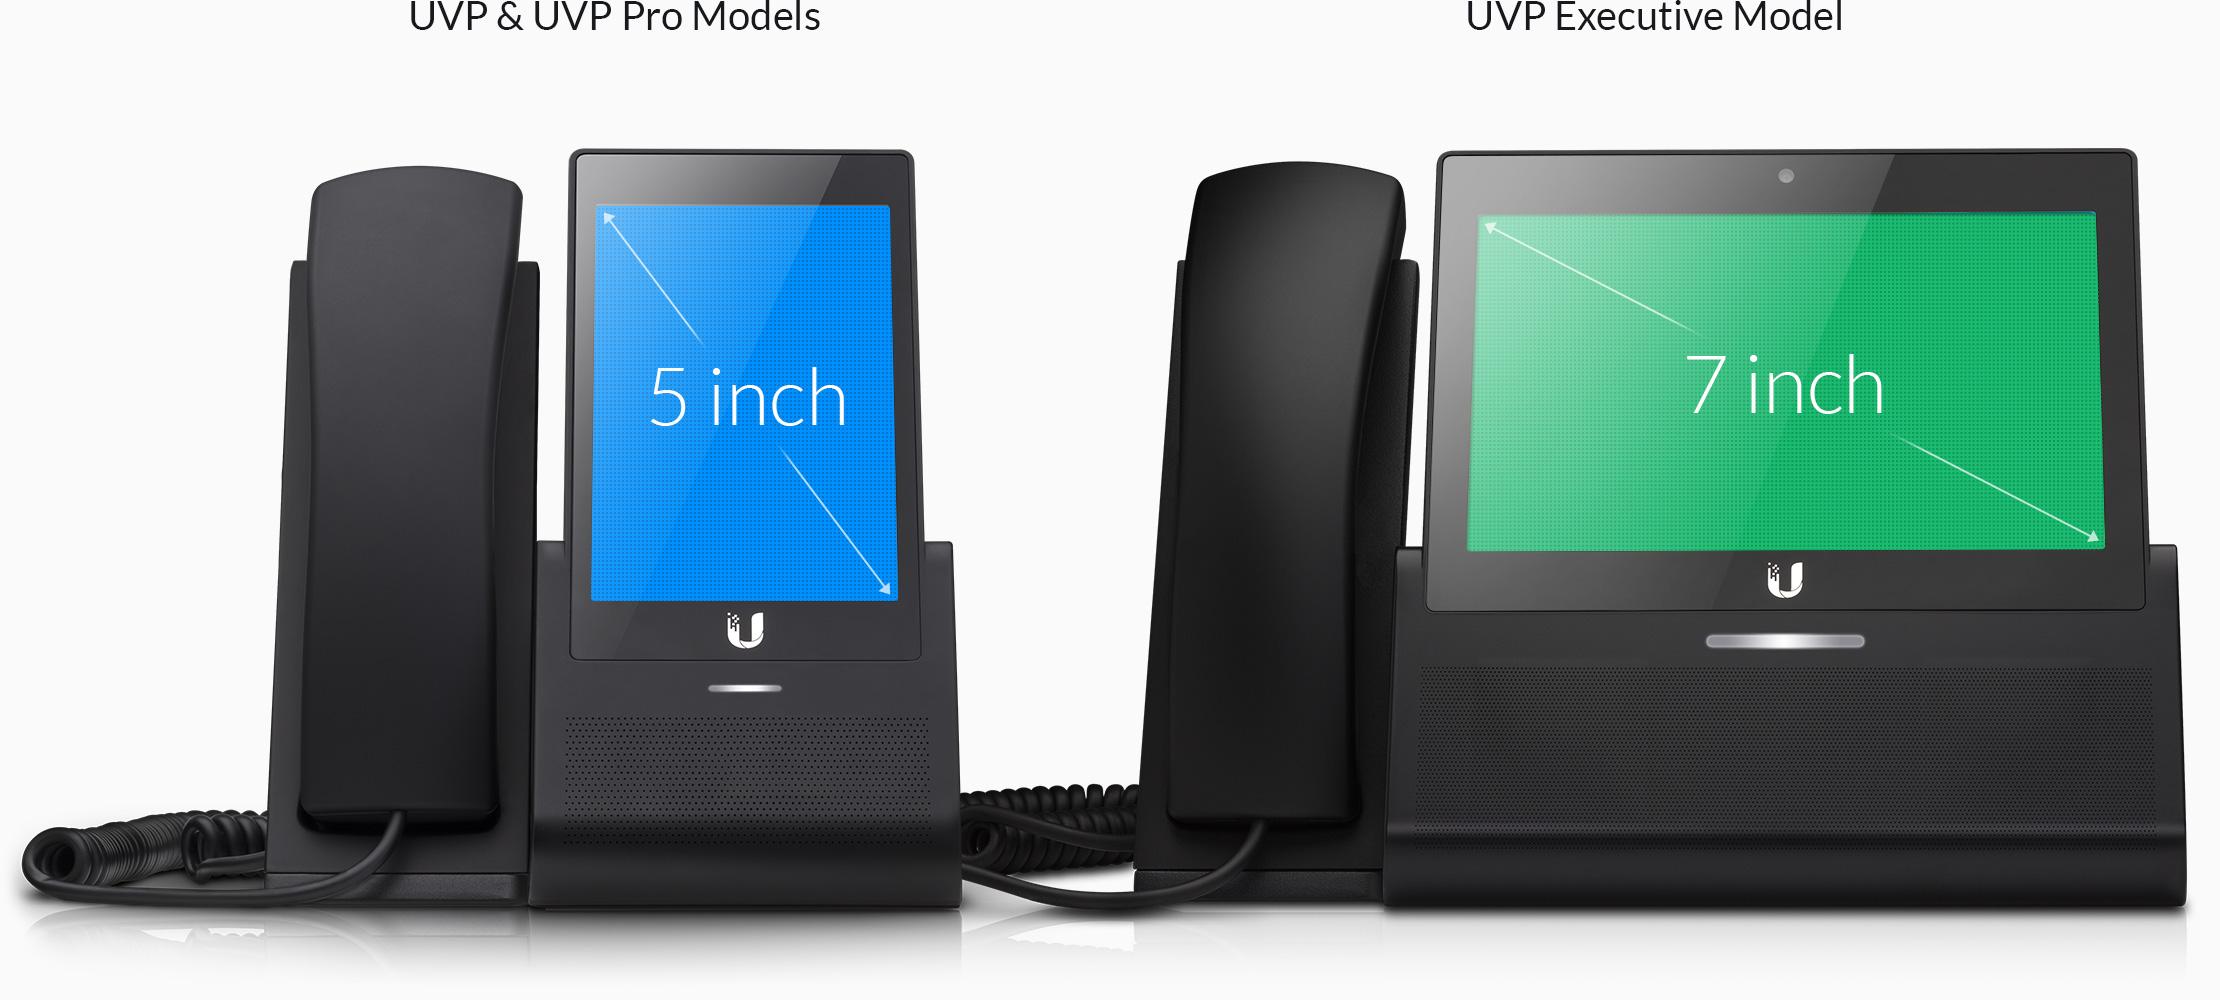 Ubiquiti Networks Unifi Voip Overview An Hd Touchscreen